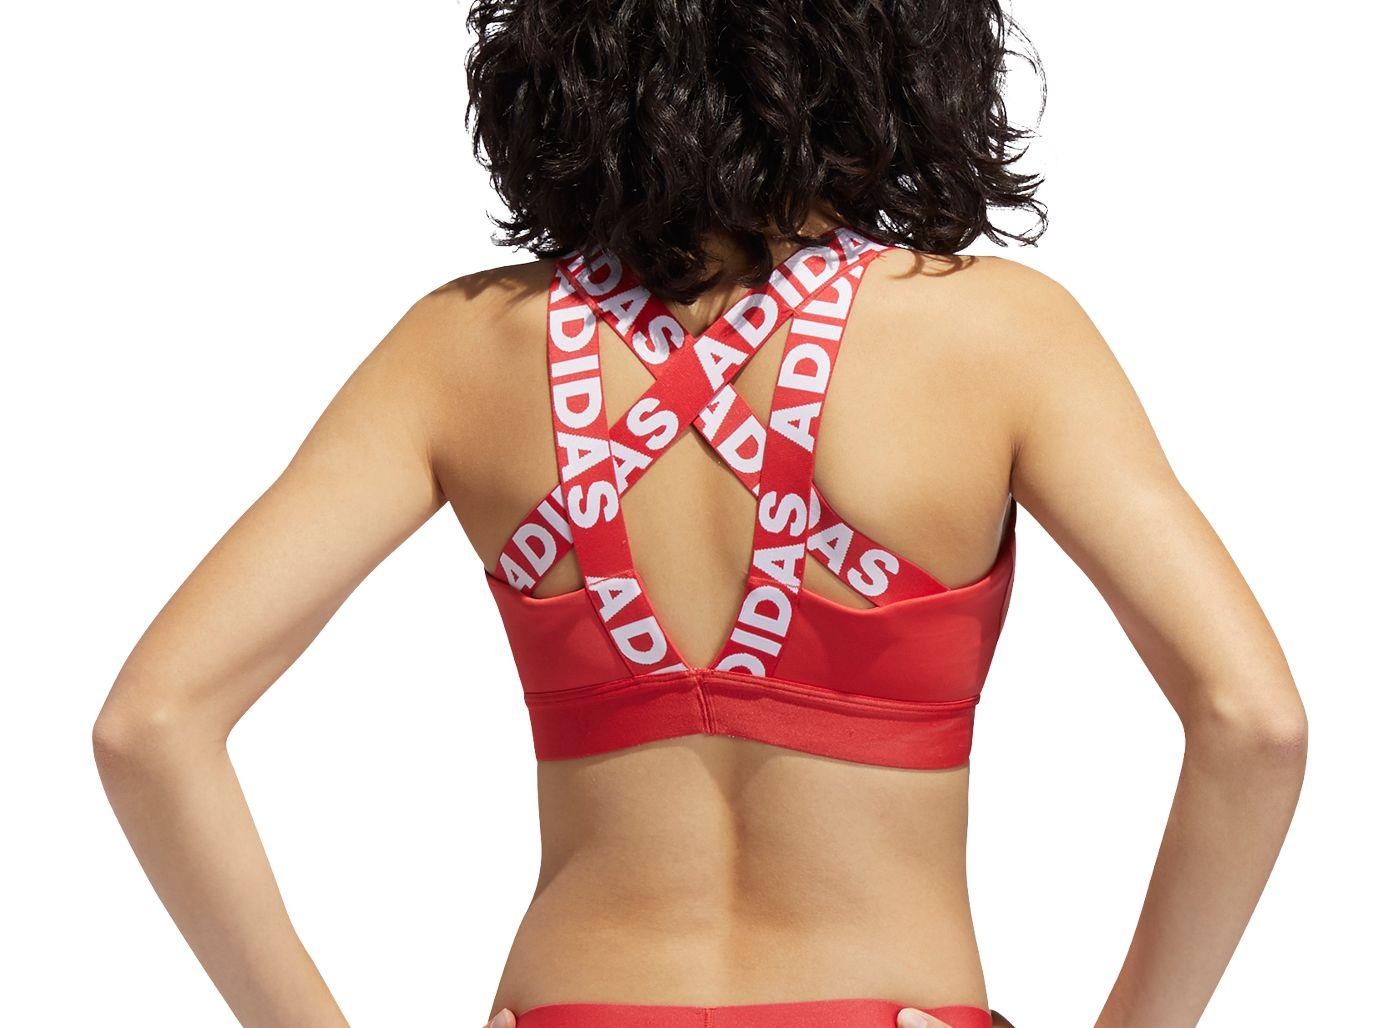 adidas Women's Don't Rest Branded Bra